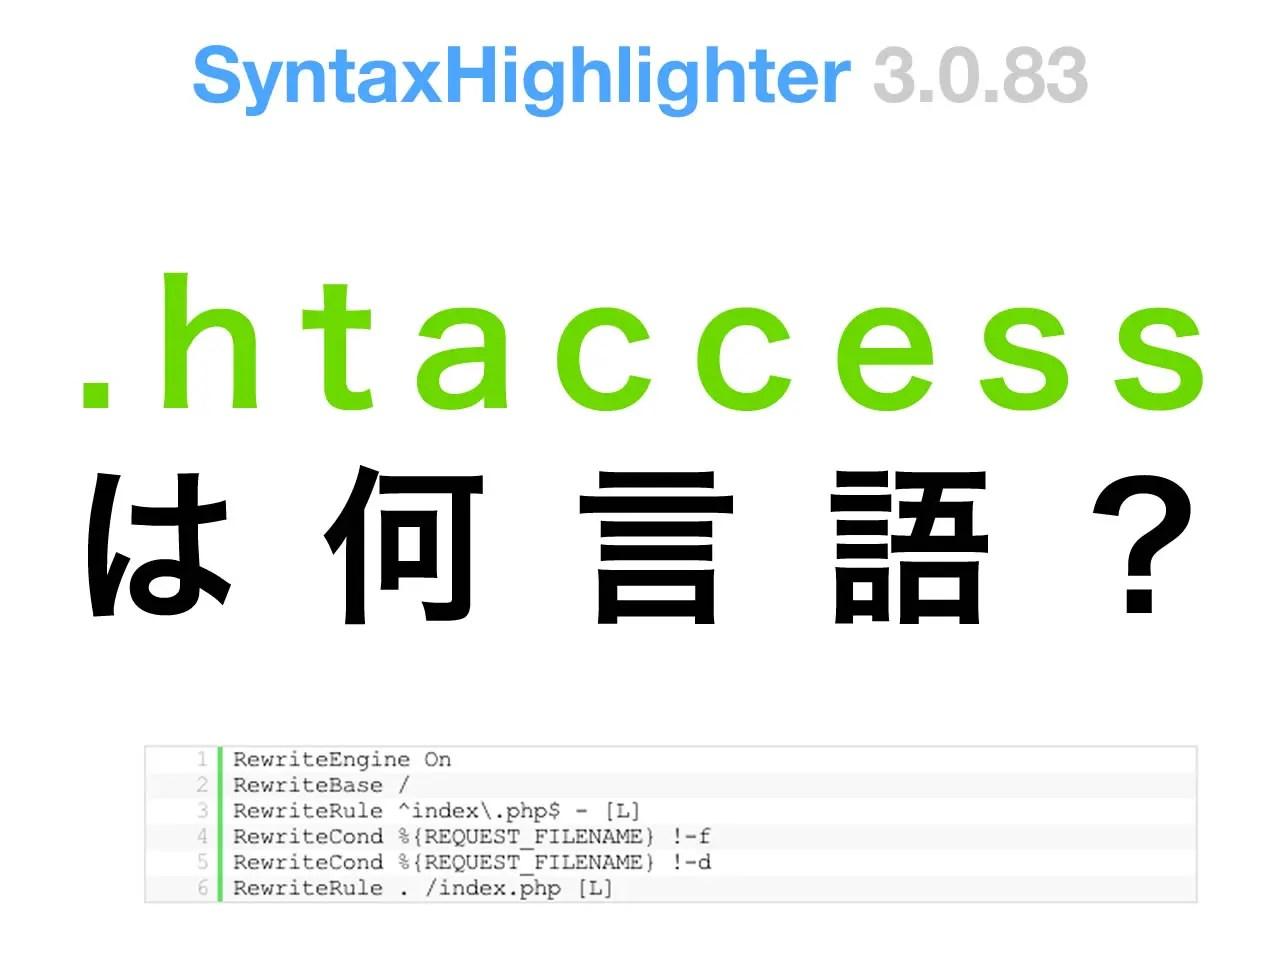 SyntaxHighlighterで.htaccessの場合の言語は何? | トラブルシューティング